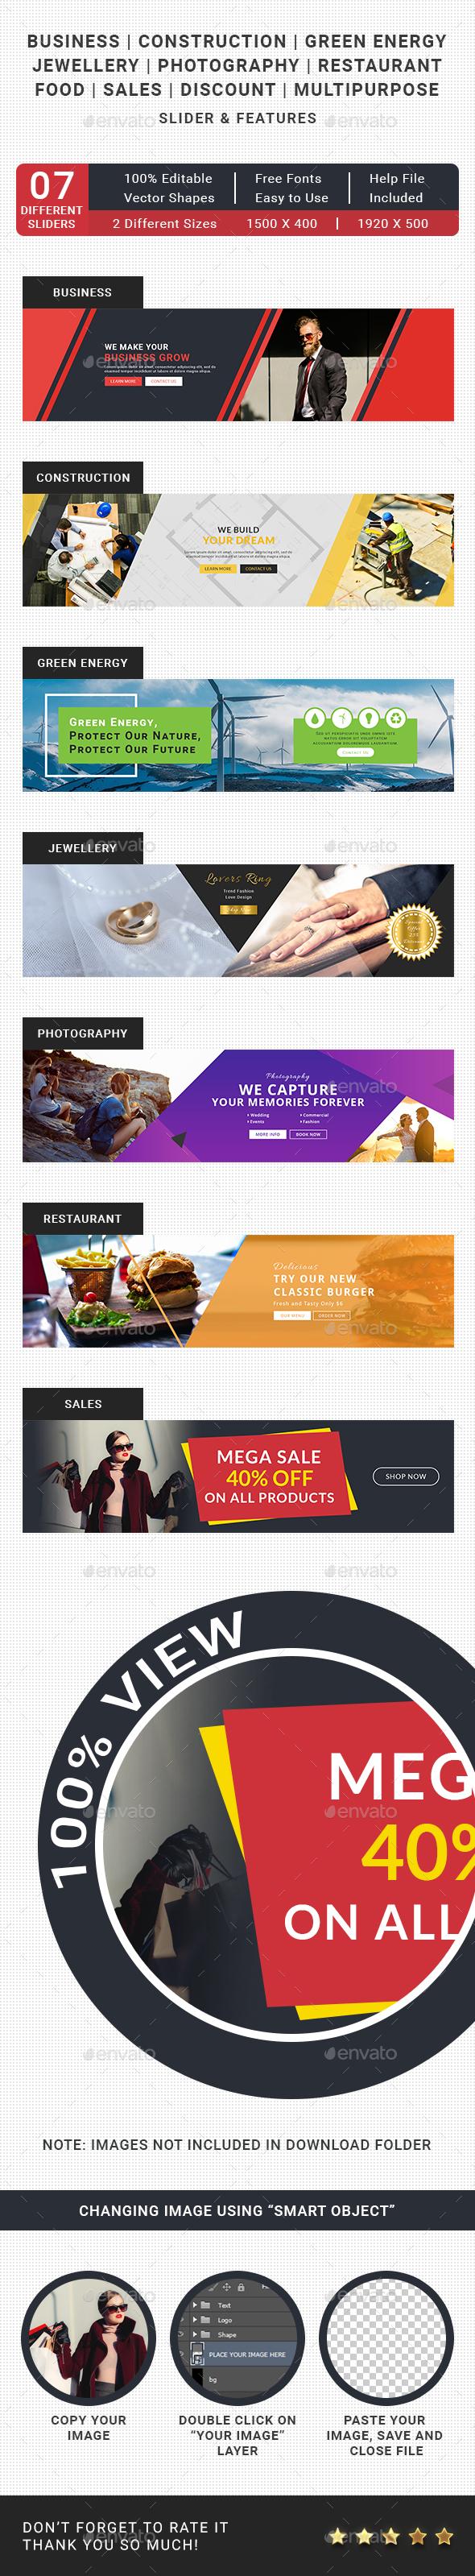 7 Creative Sliders - Sliders & Features Web Elements